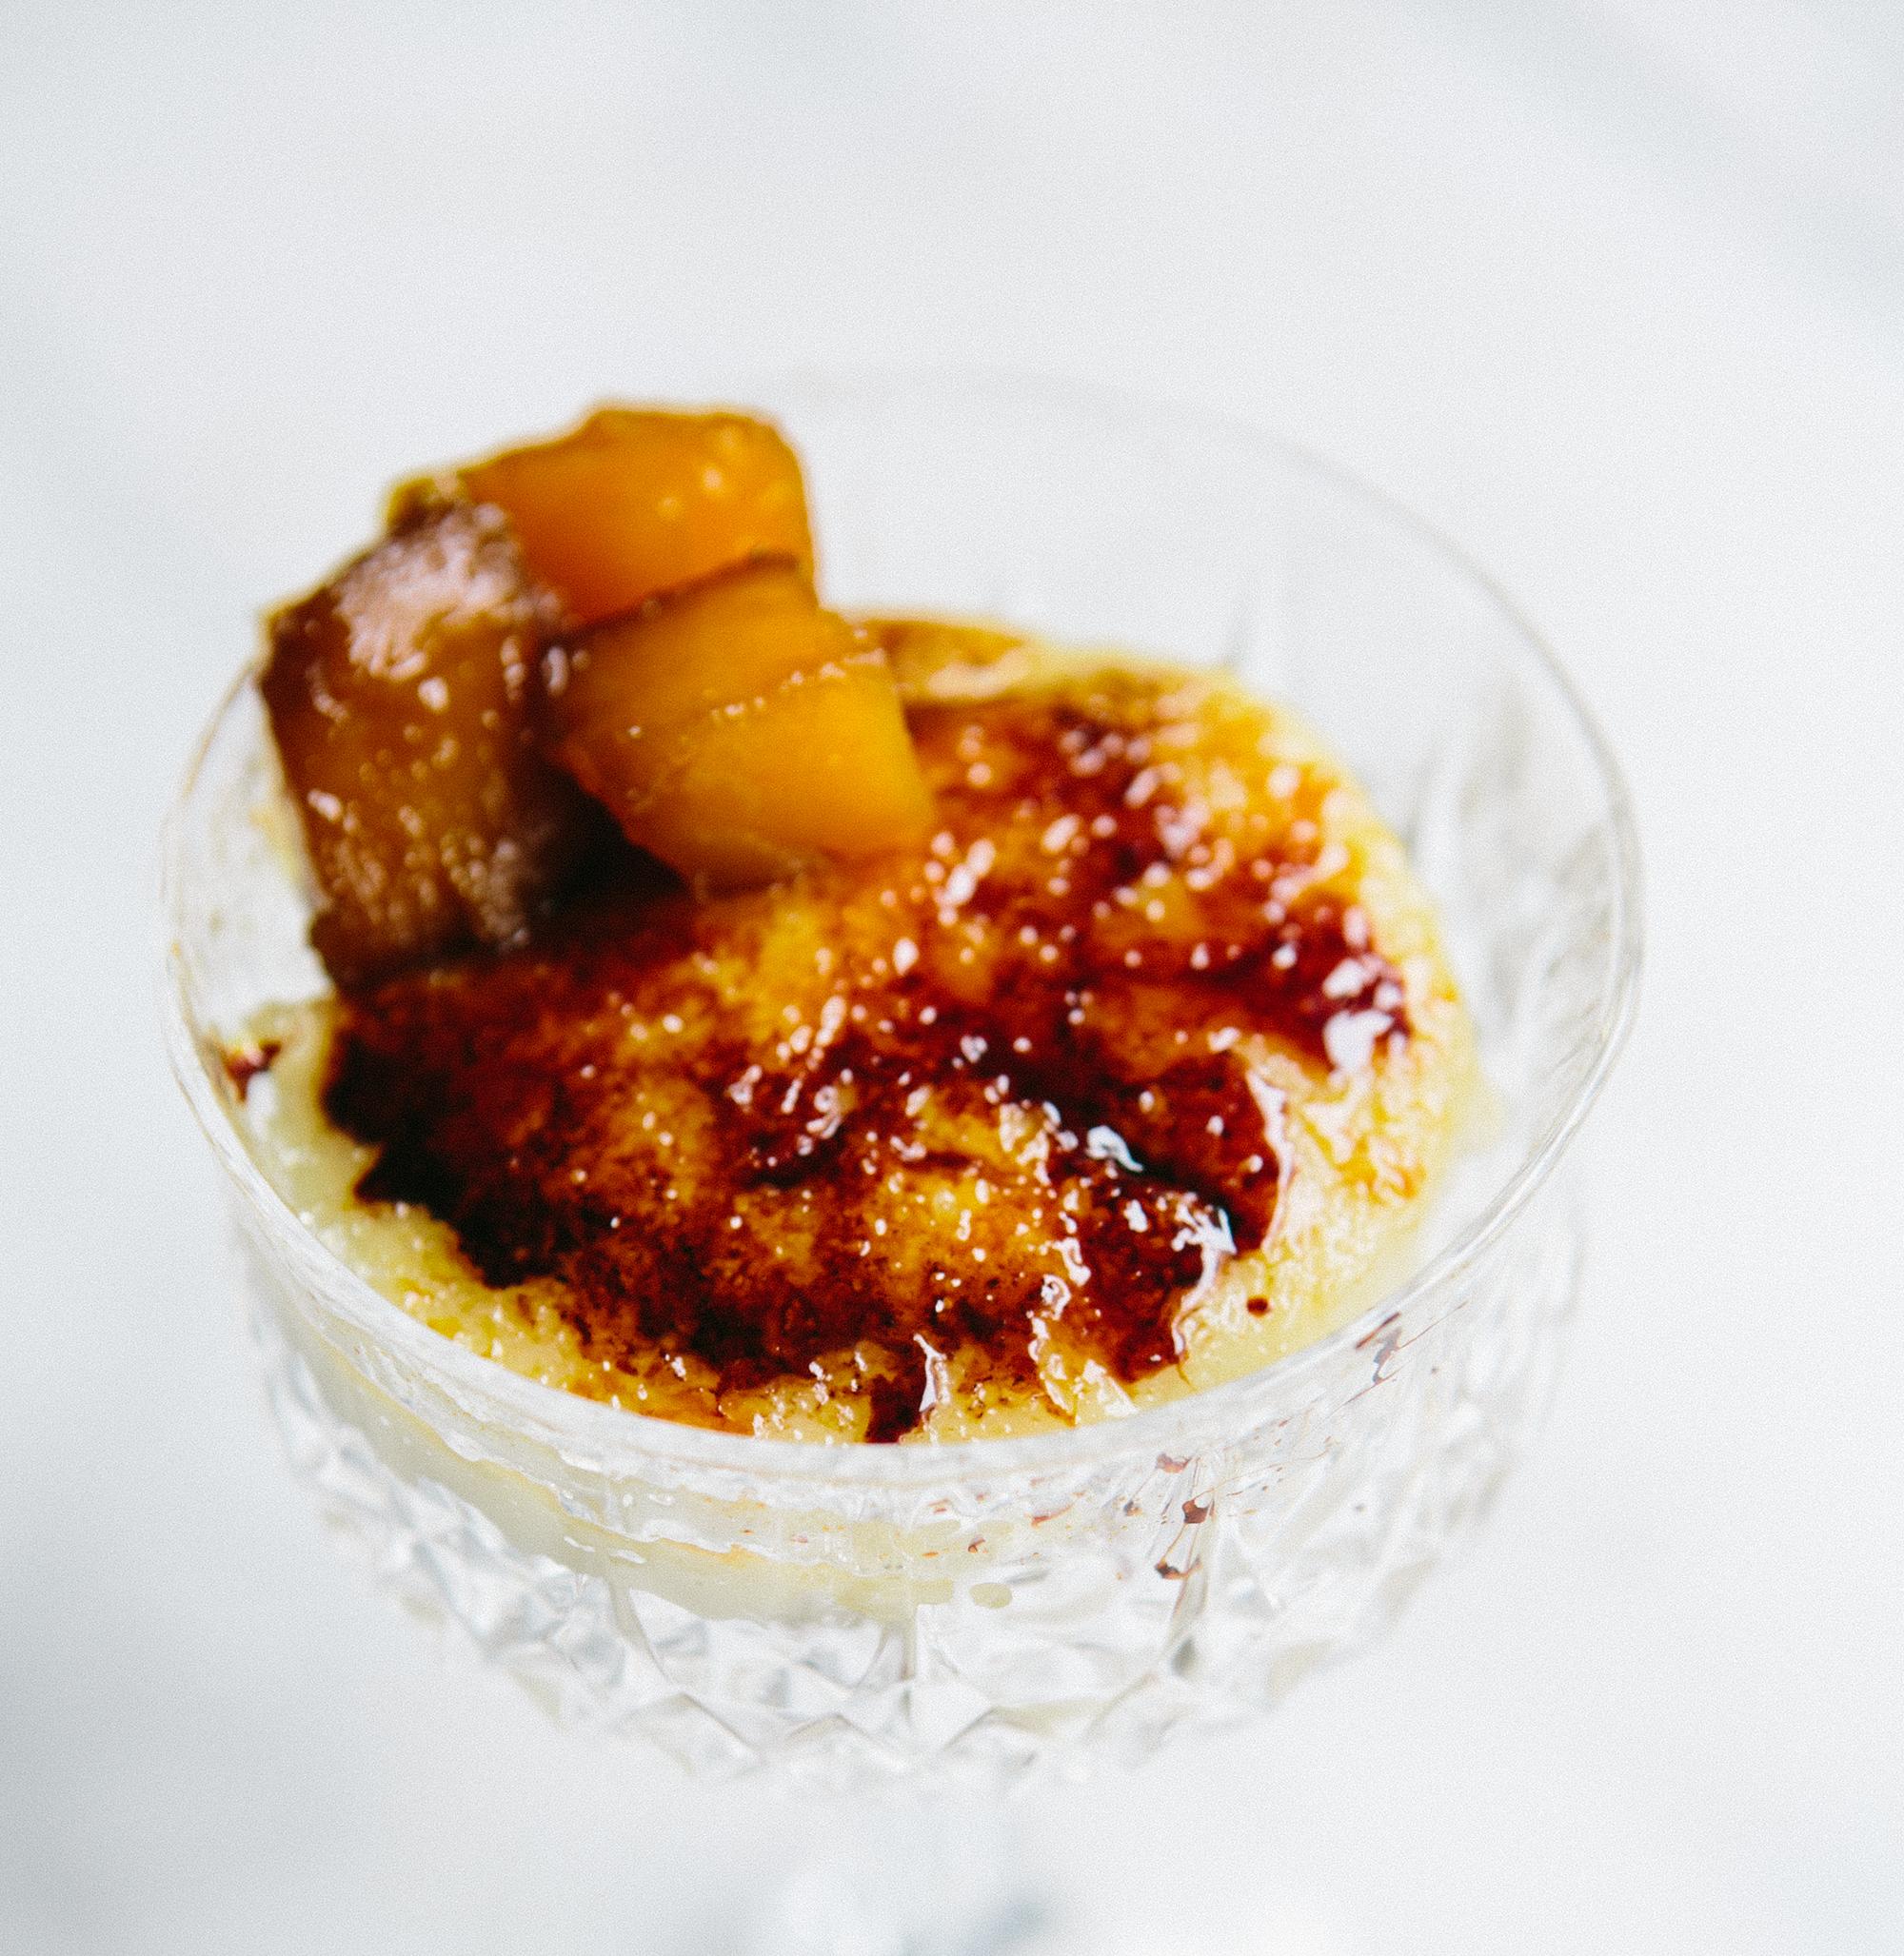 Cardamom Creme Brulee Parfait with Candied Pumpkin AllrecipesPhoto